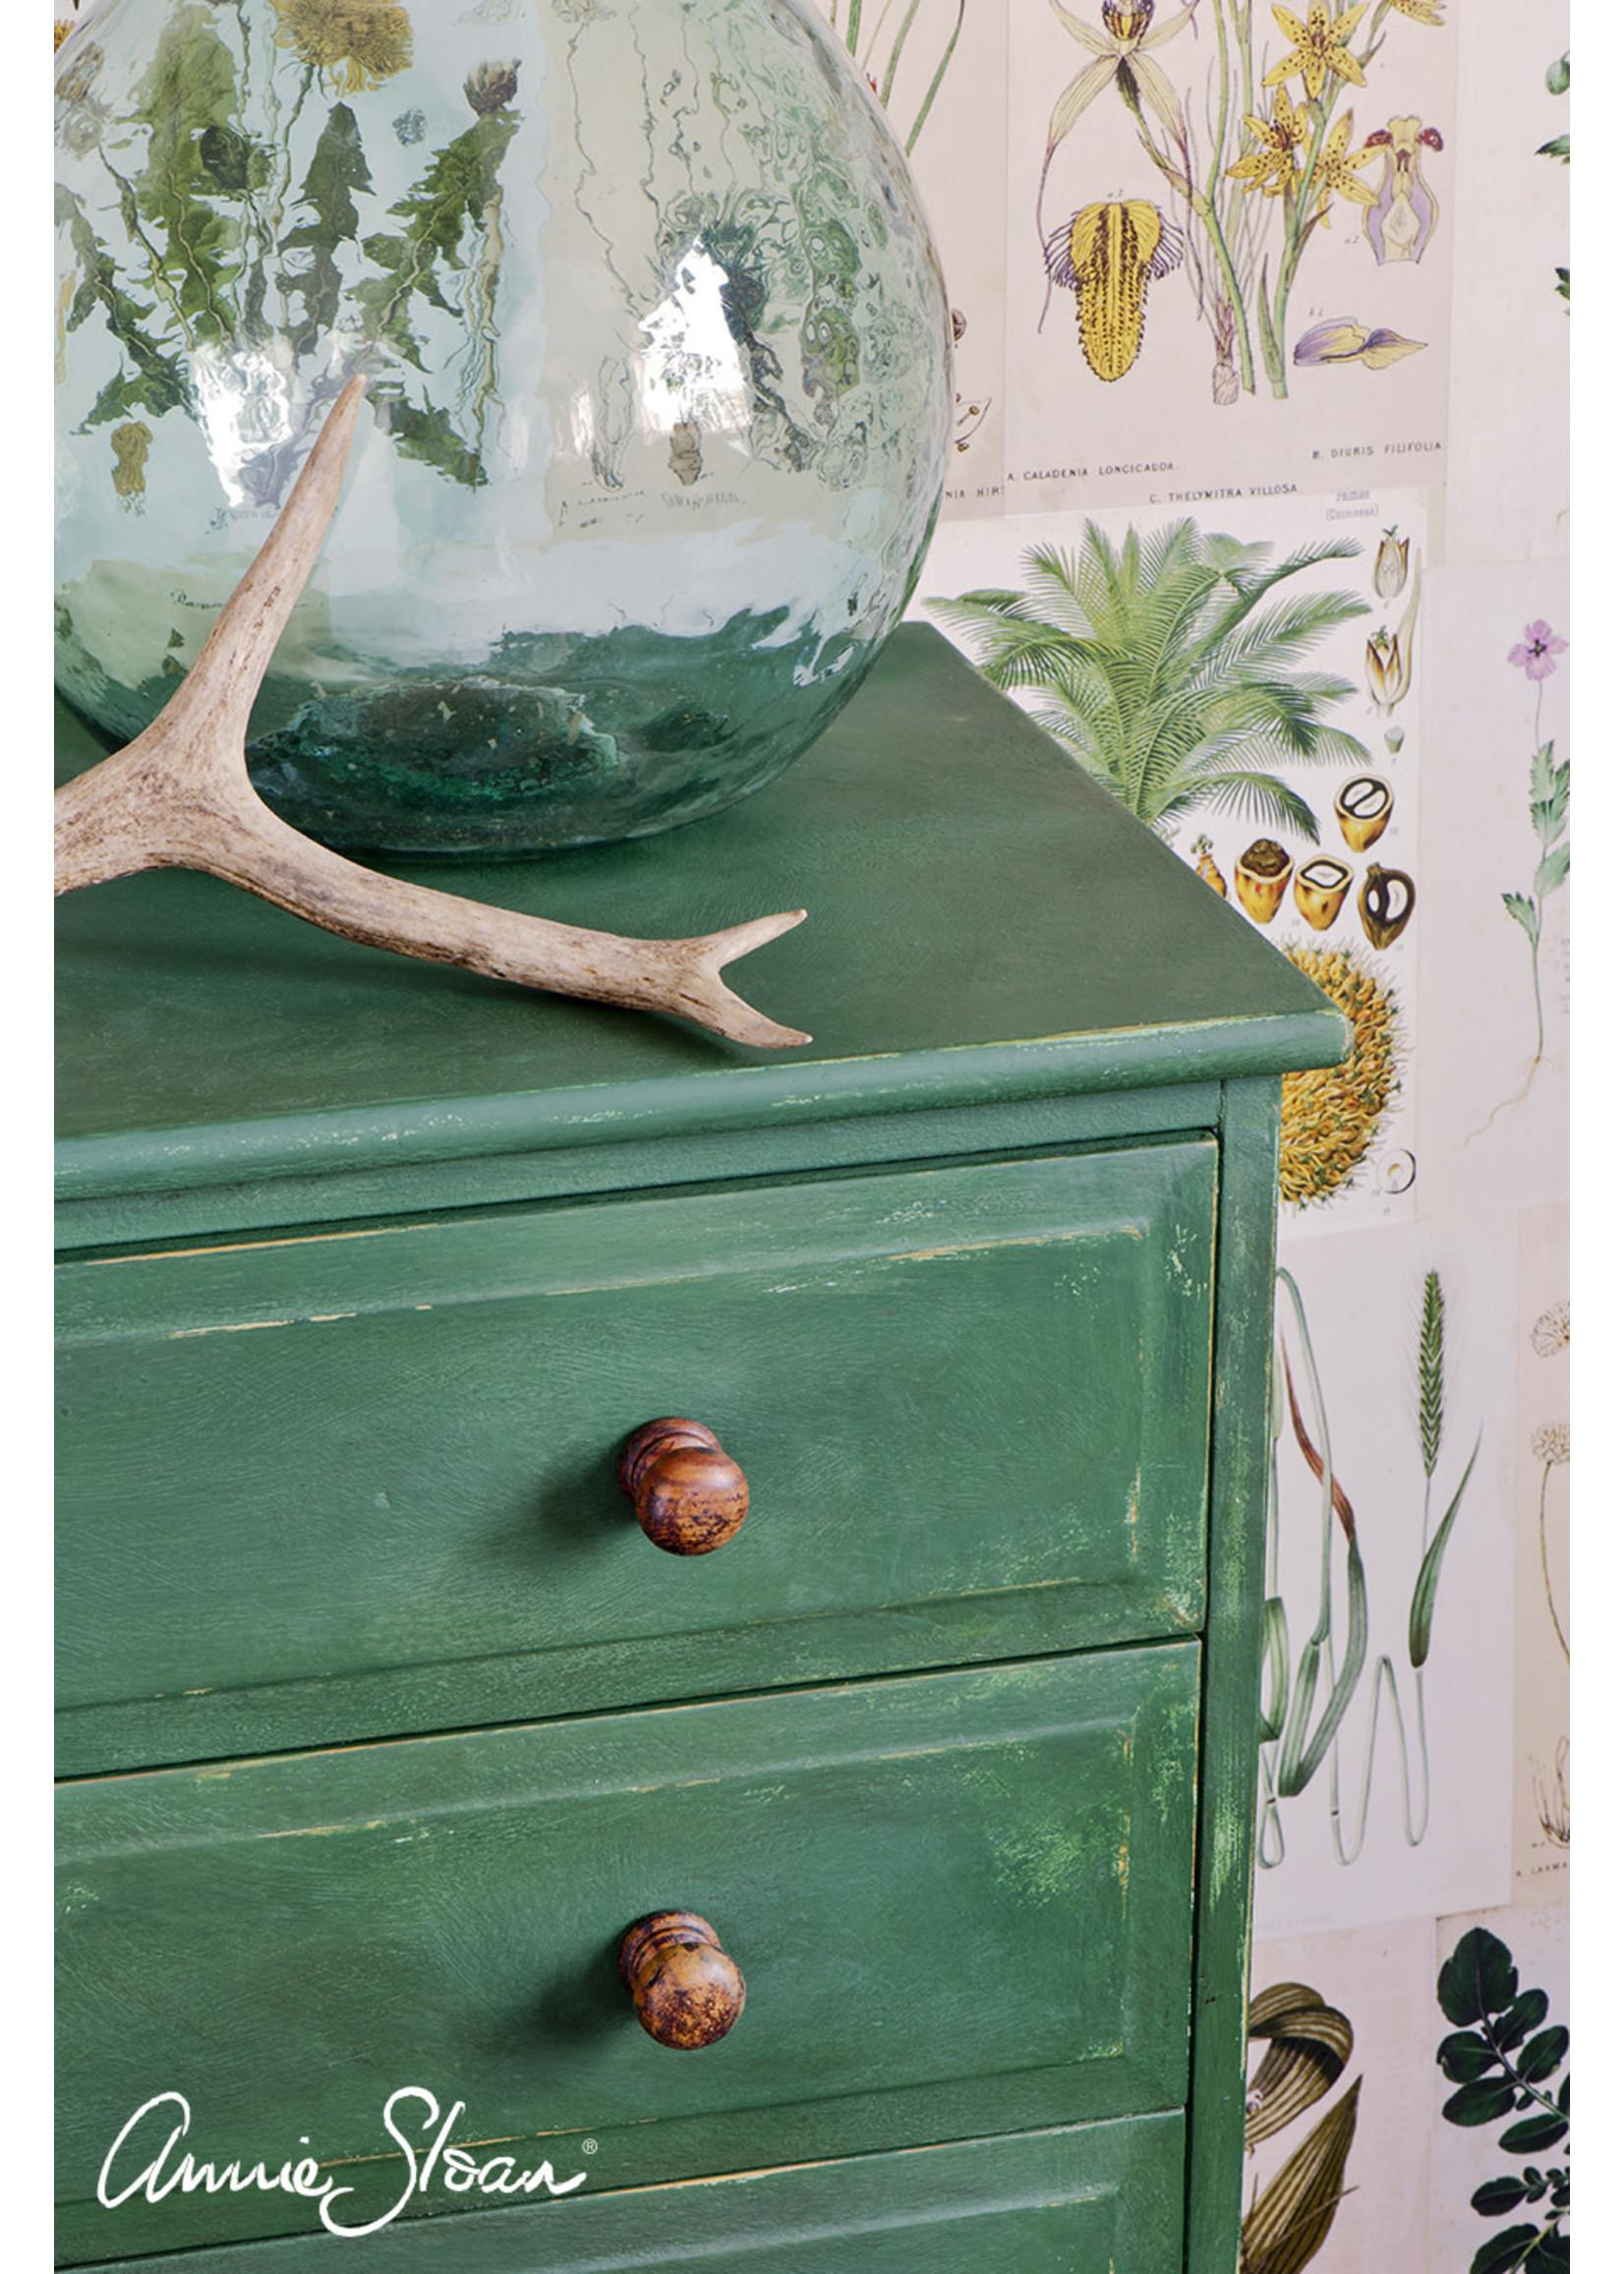 Annie Sloan Chalk Paint® Amsterdam Green Chalk Paint ®